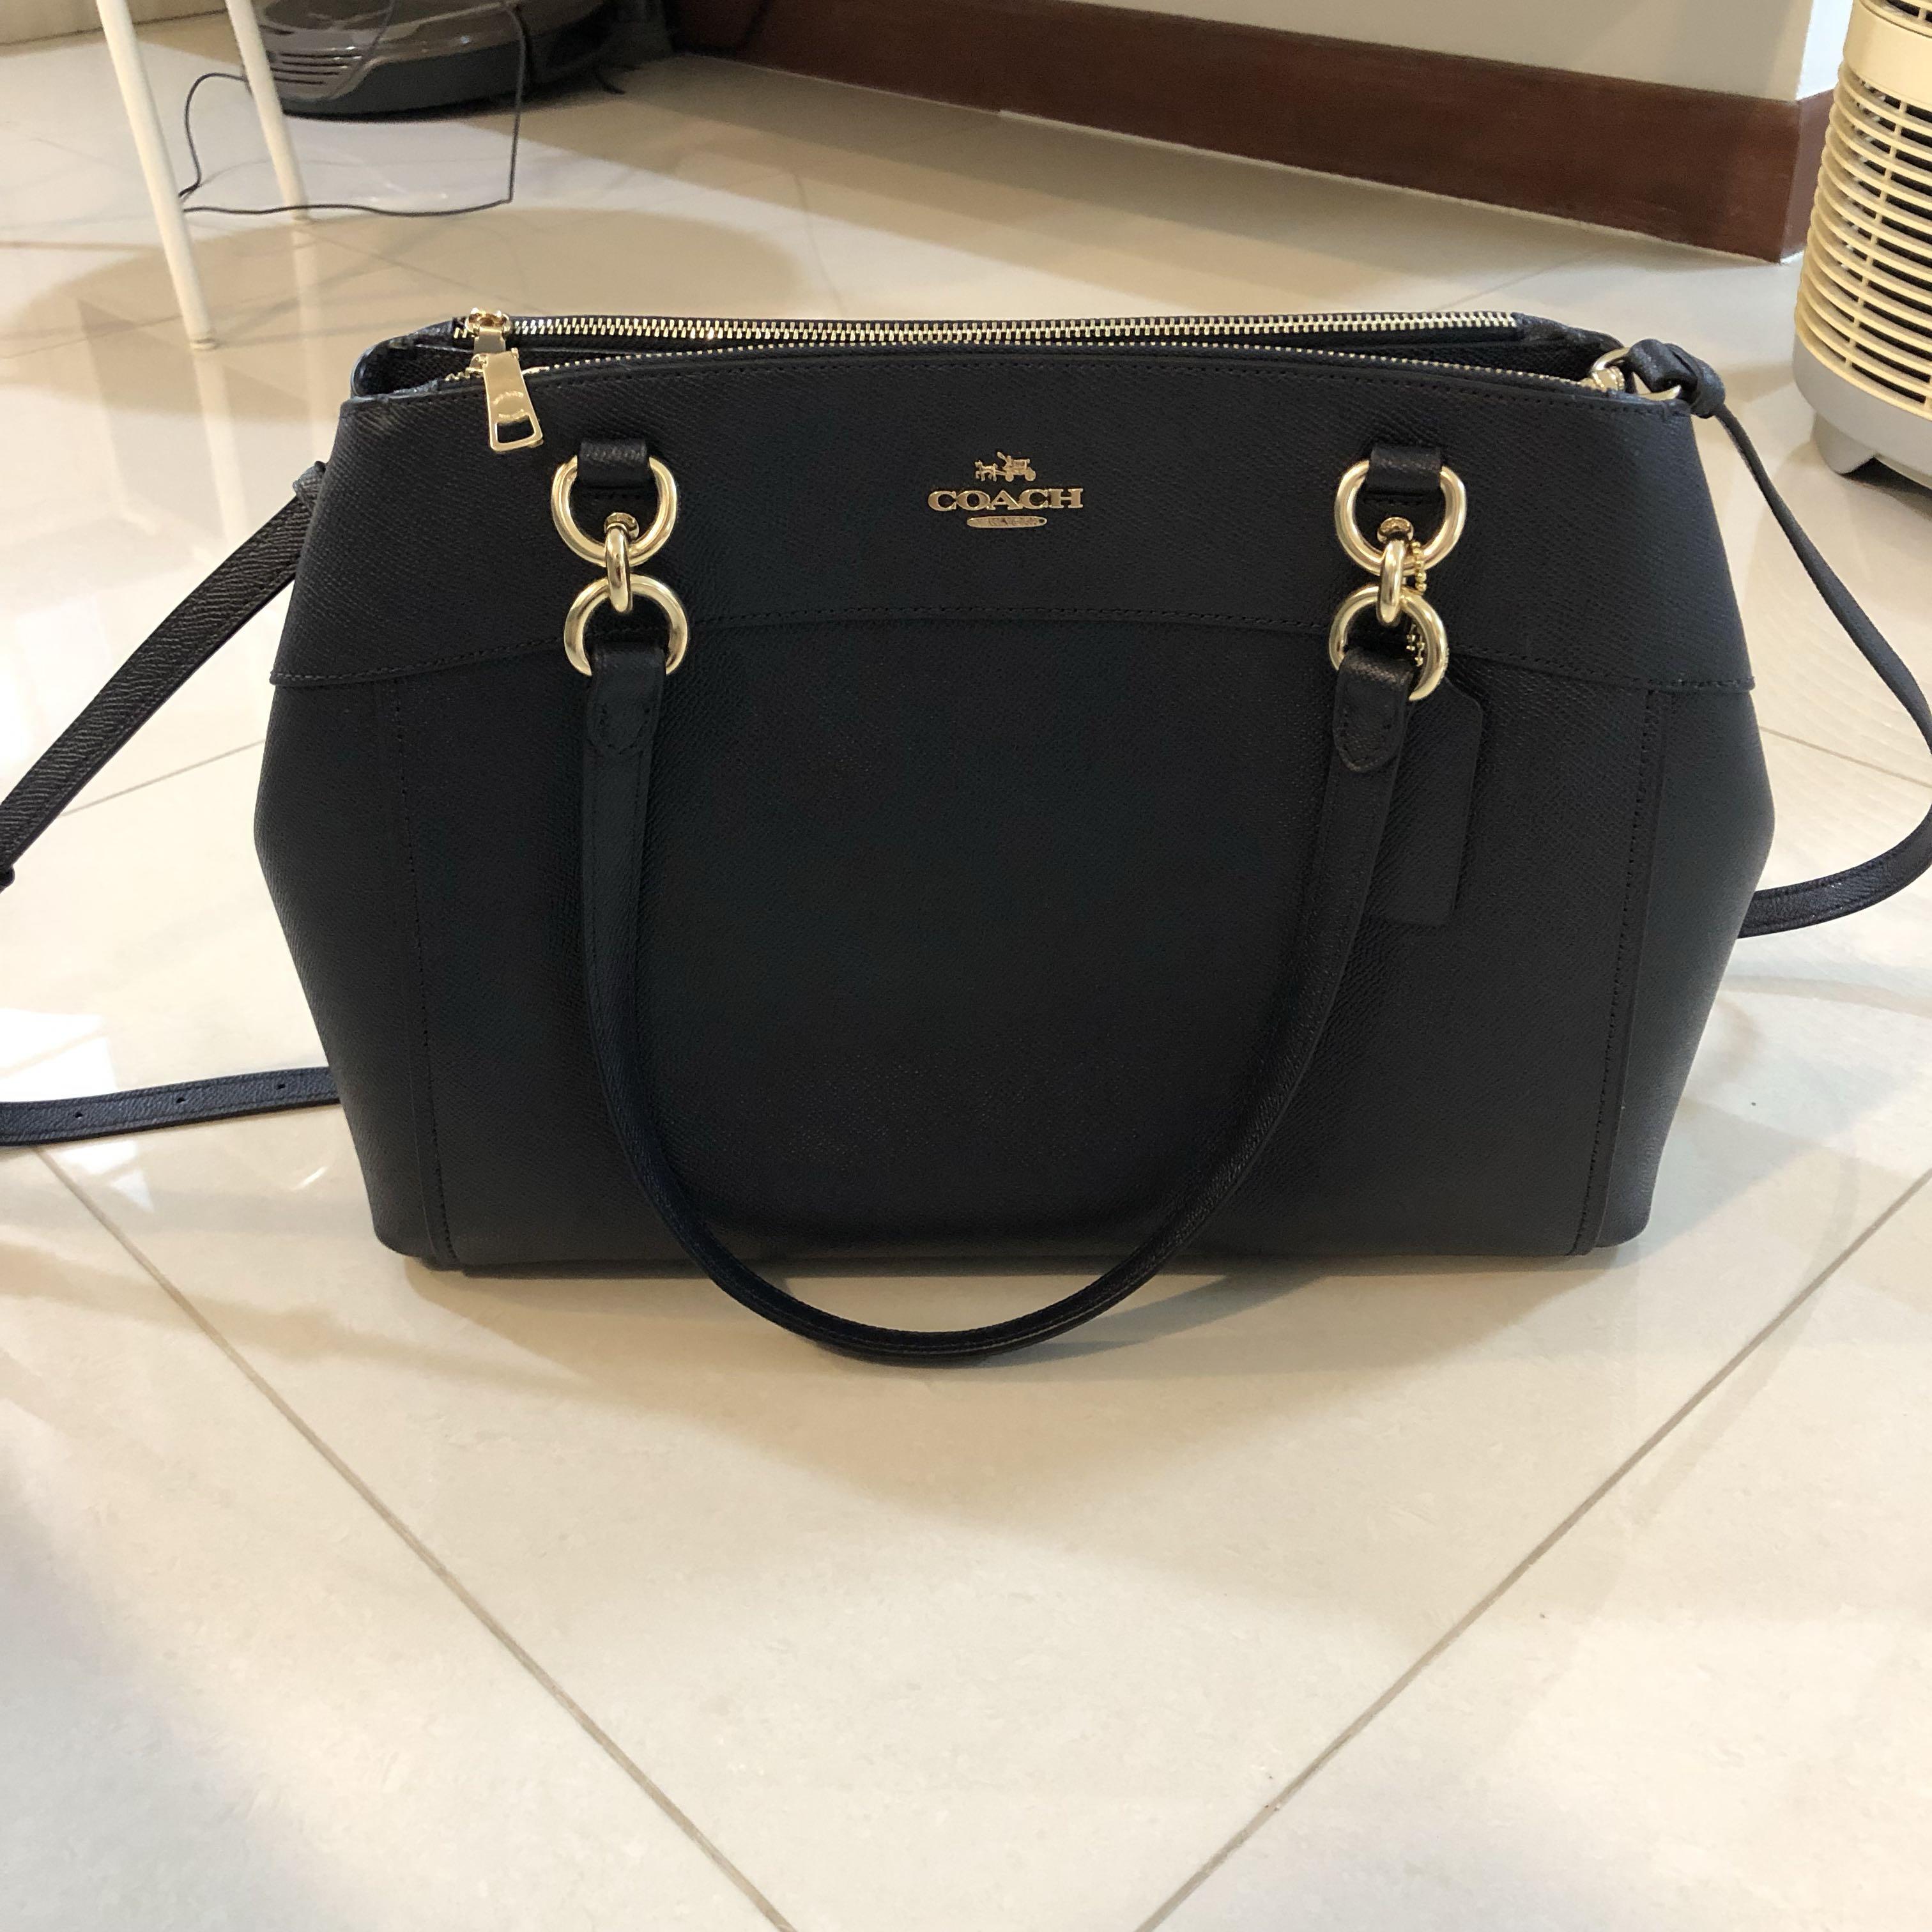 02edb59a7 Black Coach Sling Bag / handbag, Luxury, Bags & Wallets, Handbags on  Carousell